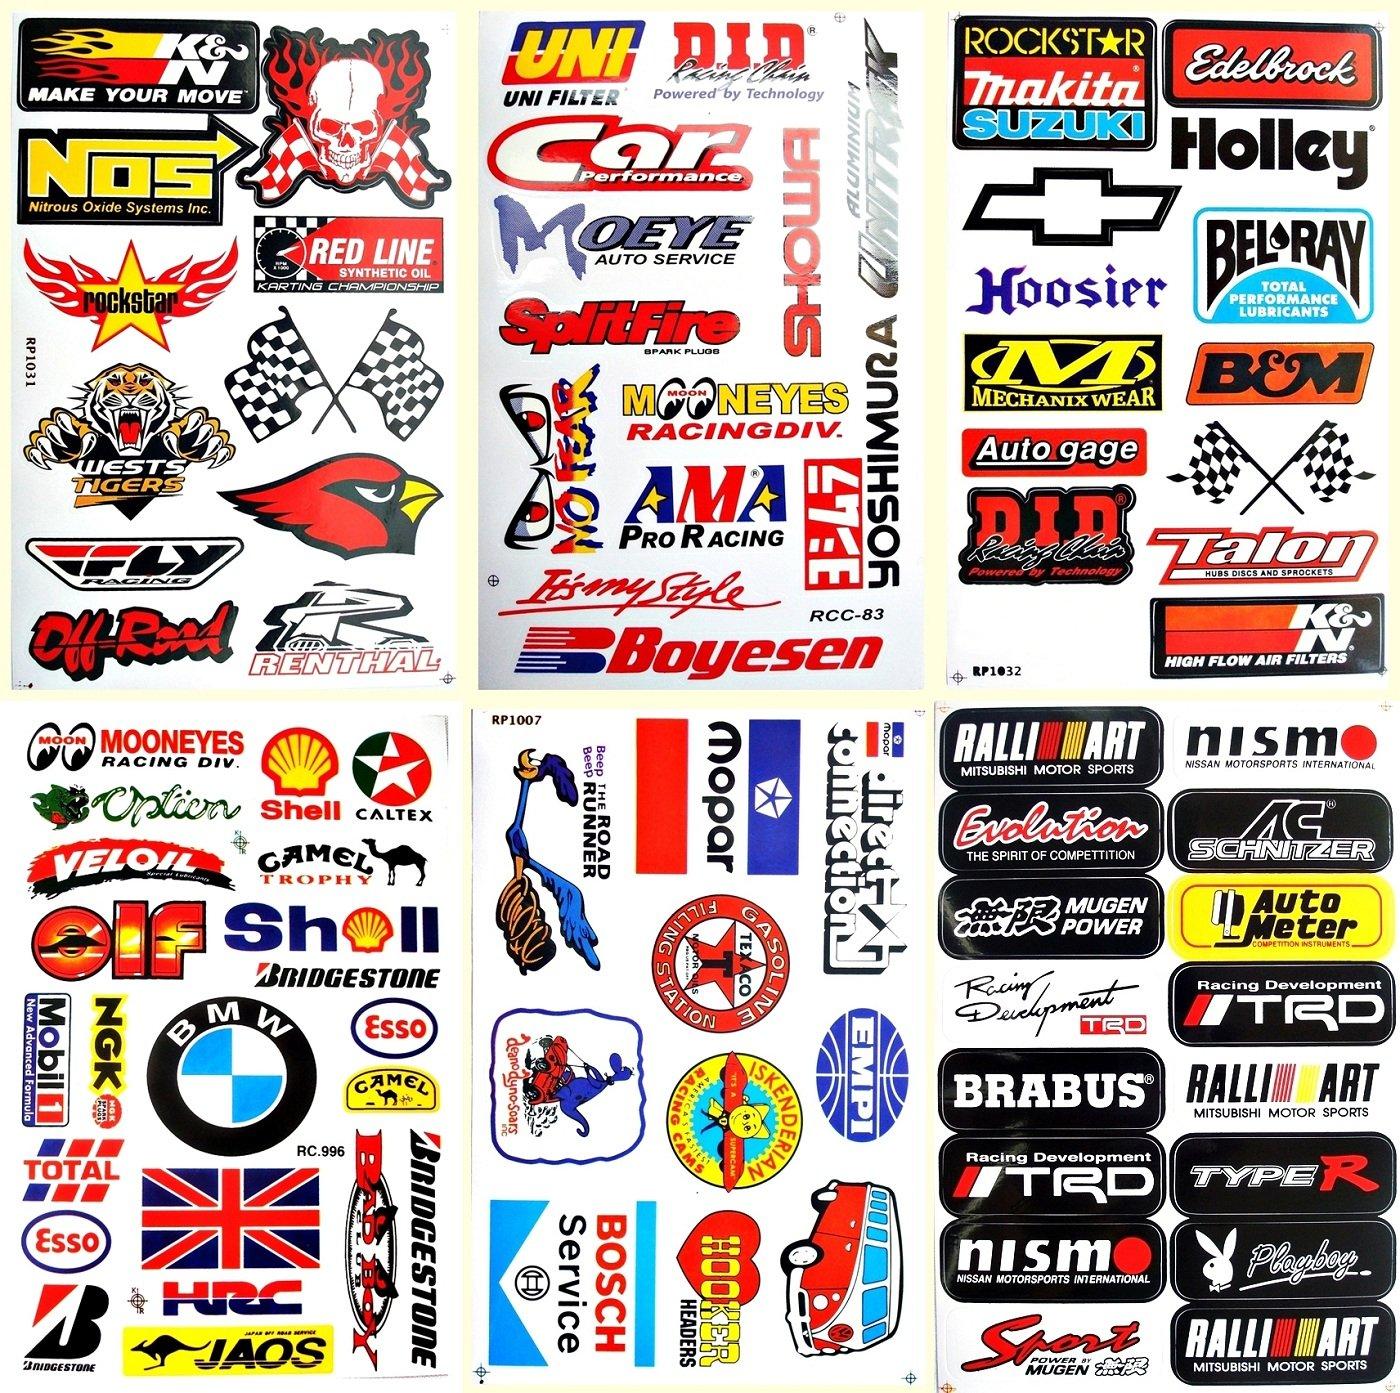 Motorsport Cars Hot Rod Nhra Drag Racing Lot 6 Vinyl Decals Stickers D6053